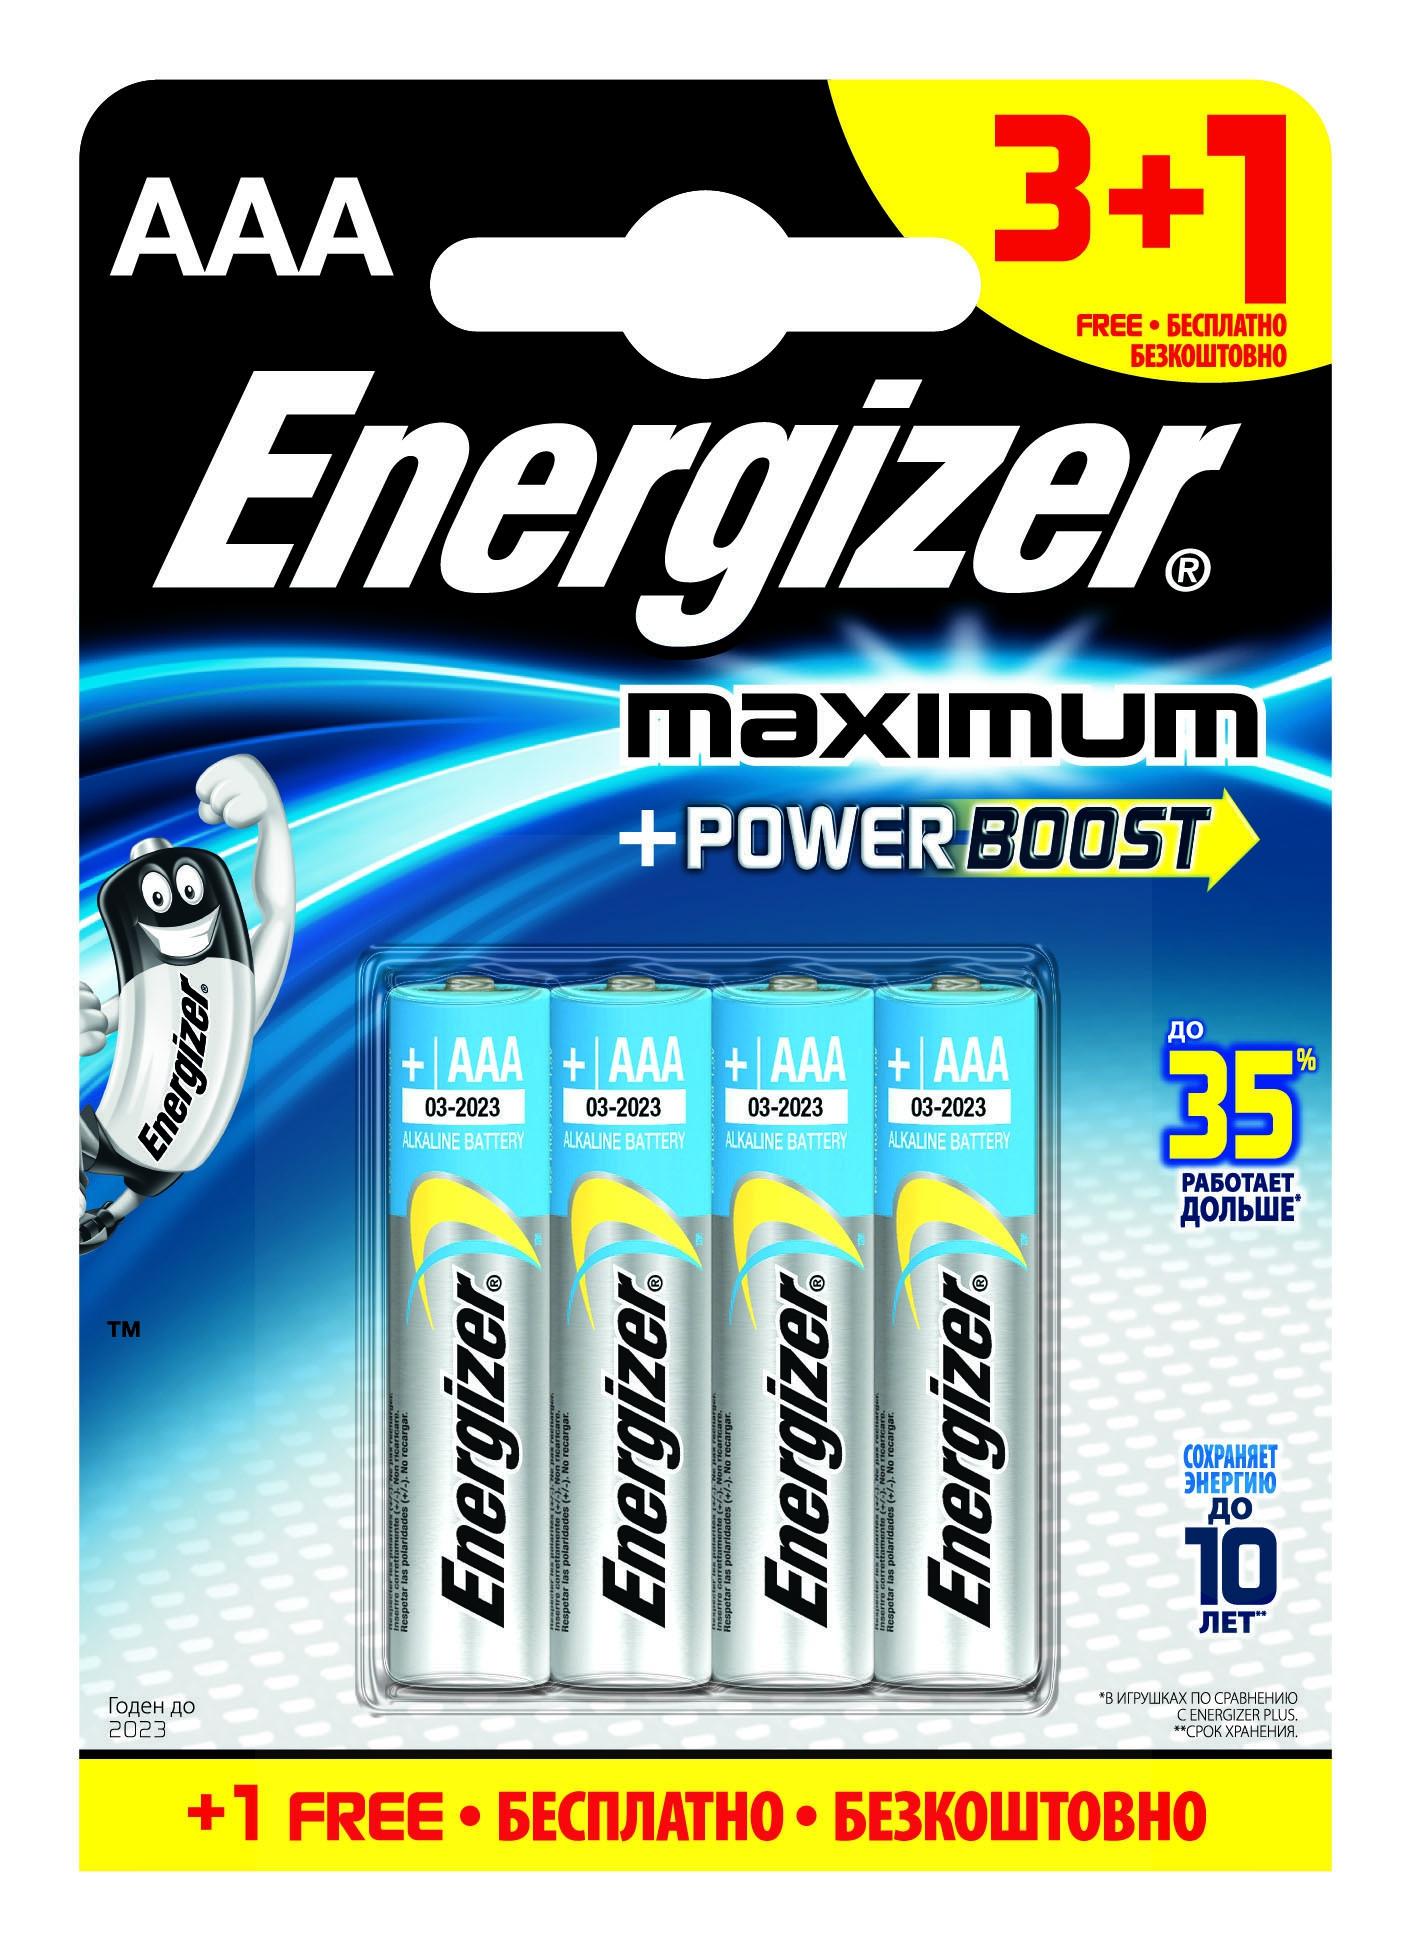 Батарейки Energizer Energizer Maximum AАA Промо 4 шт